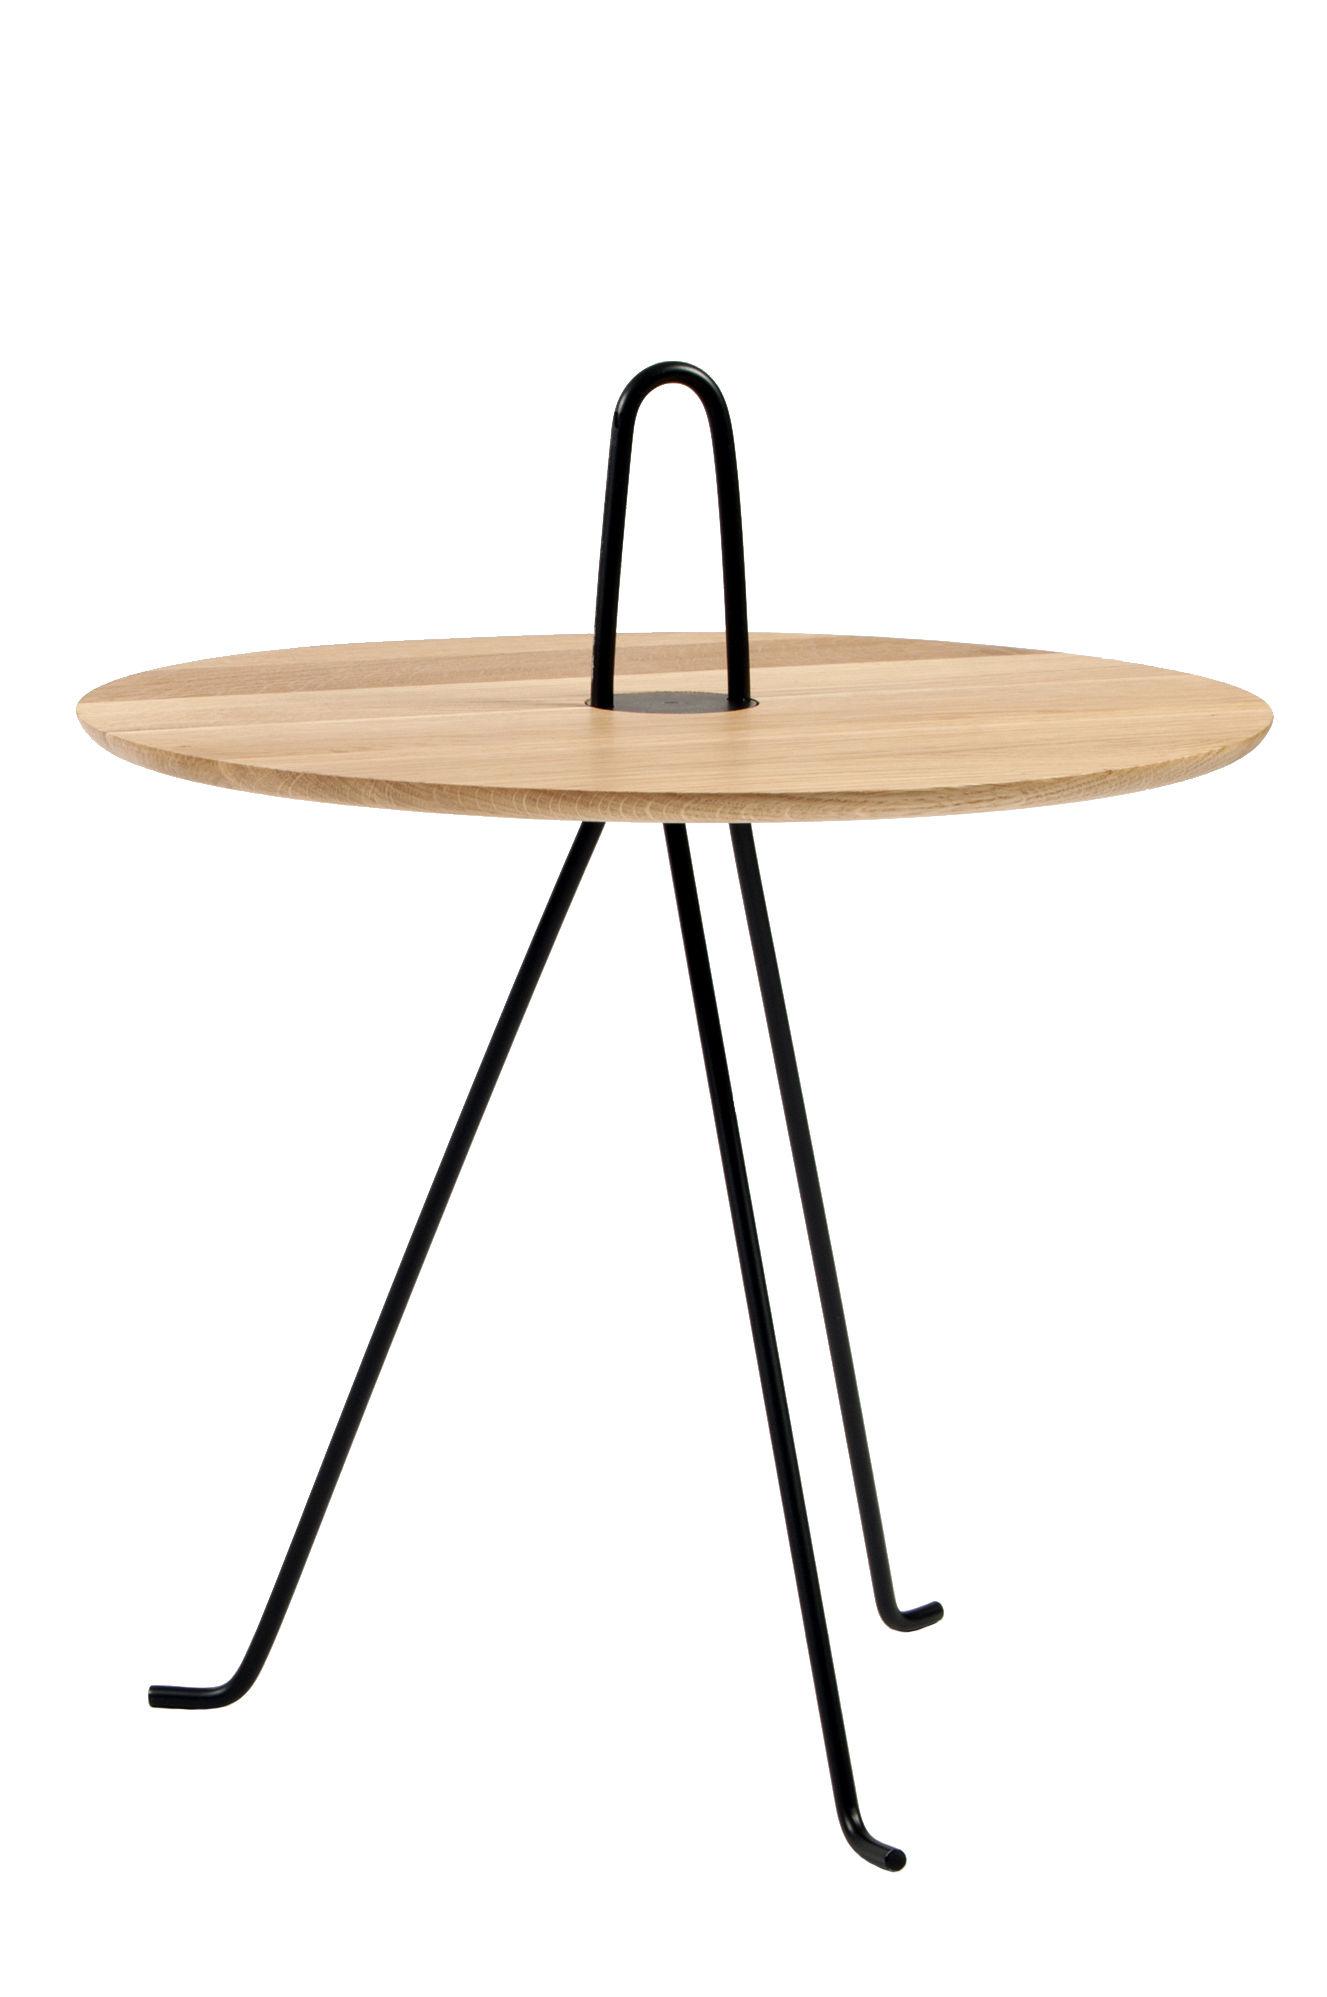 Furniture - Coffee Tables - Tipi End table - / Ø 42 x H 37 cm - Oak by Objekto - Natural oak / Black leg - Acier peint recyclé, Solid oak